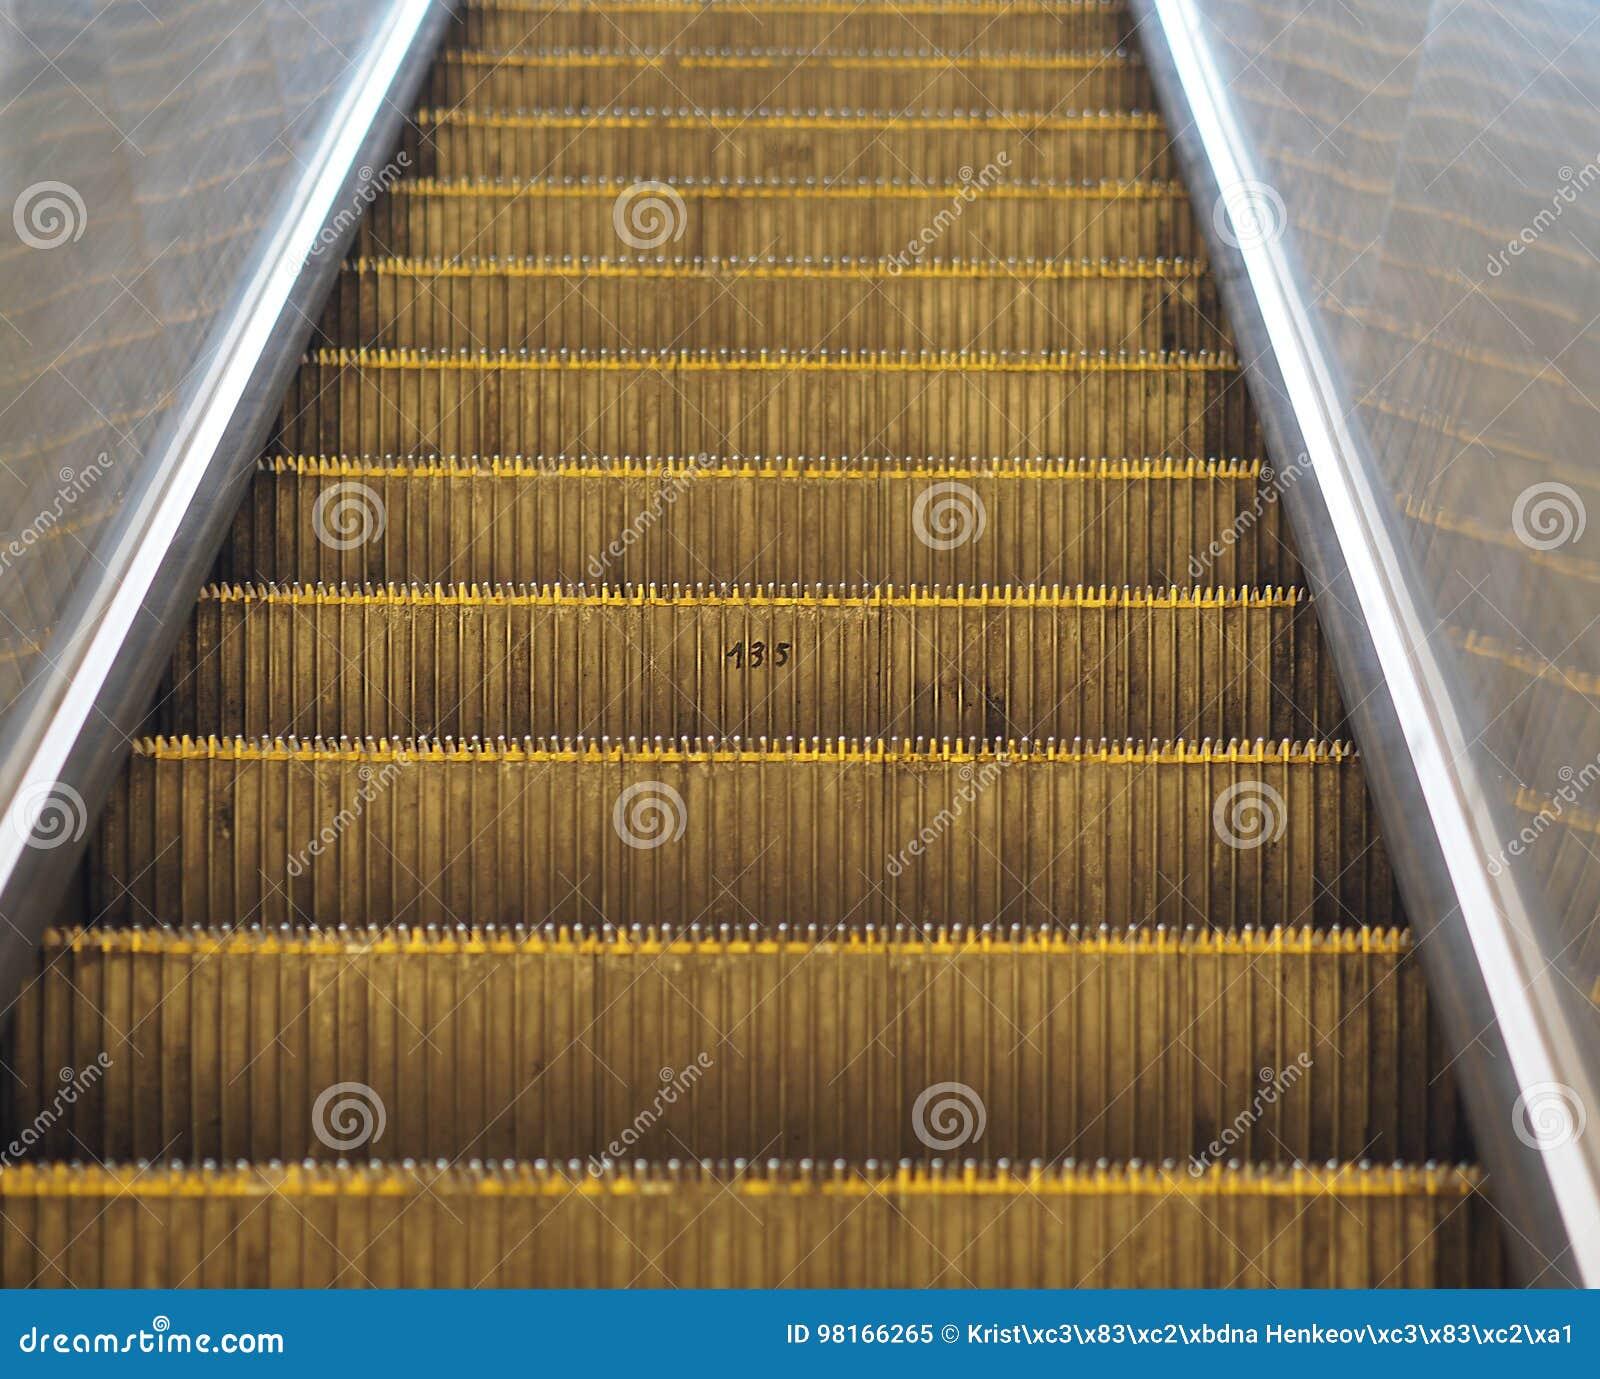 Detail Of Prague Escalator In Subway Moving Staircase